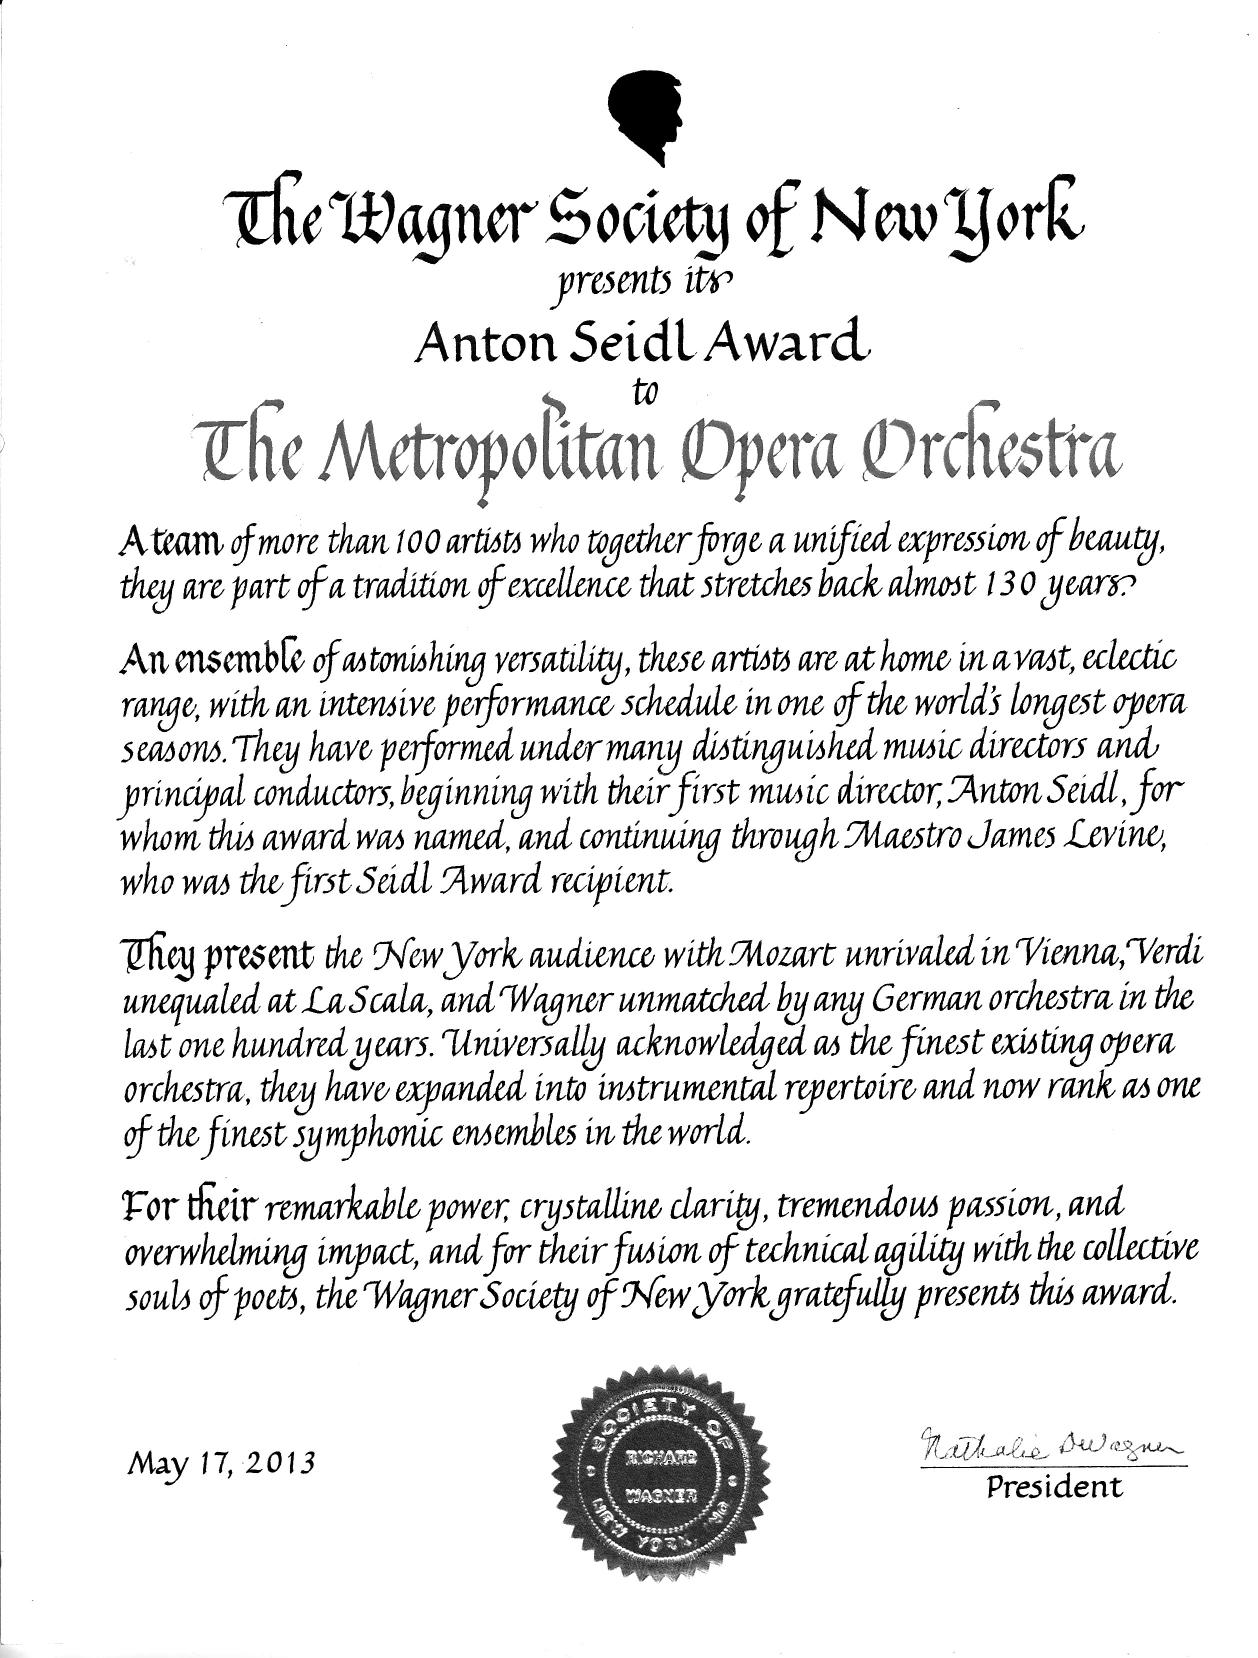 Wagner Society of New York - Anton Seidl Award 2013